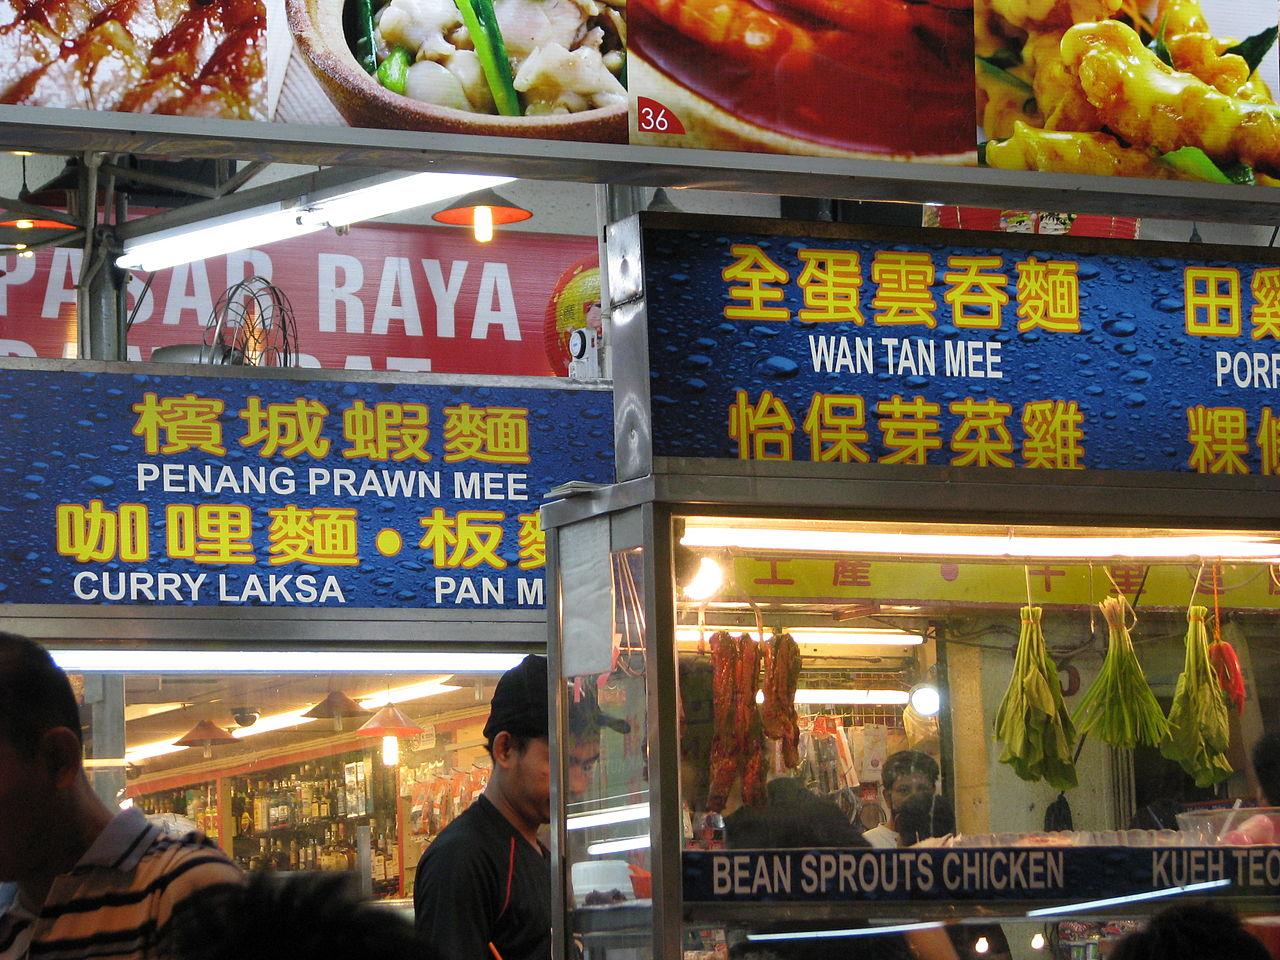 Best Spicy Food In Kl